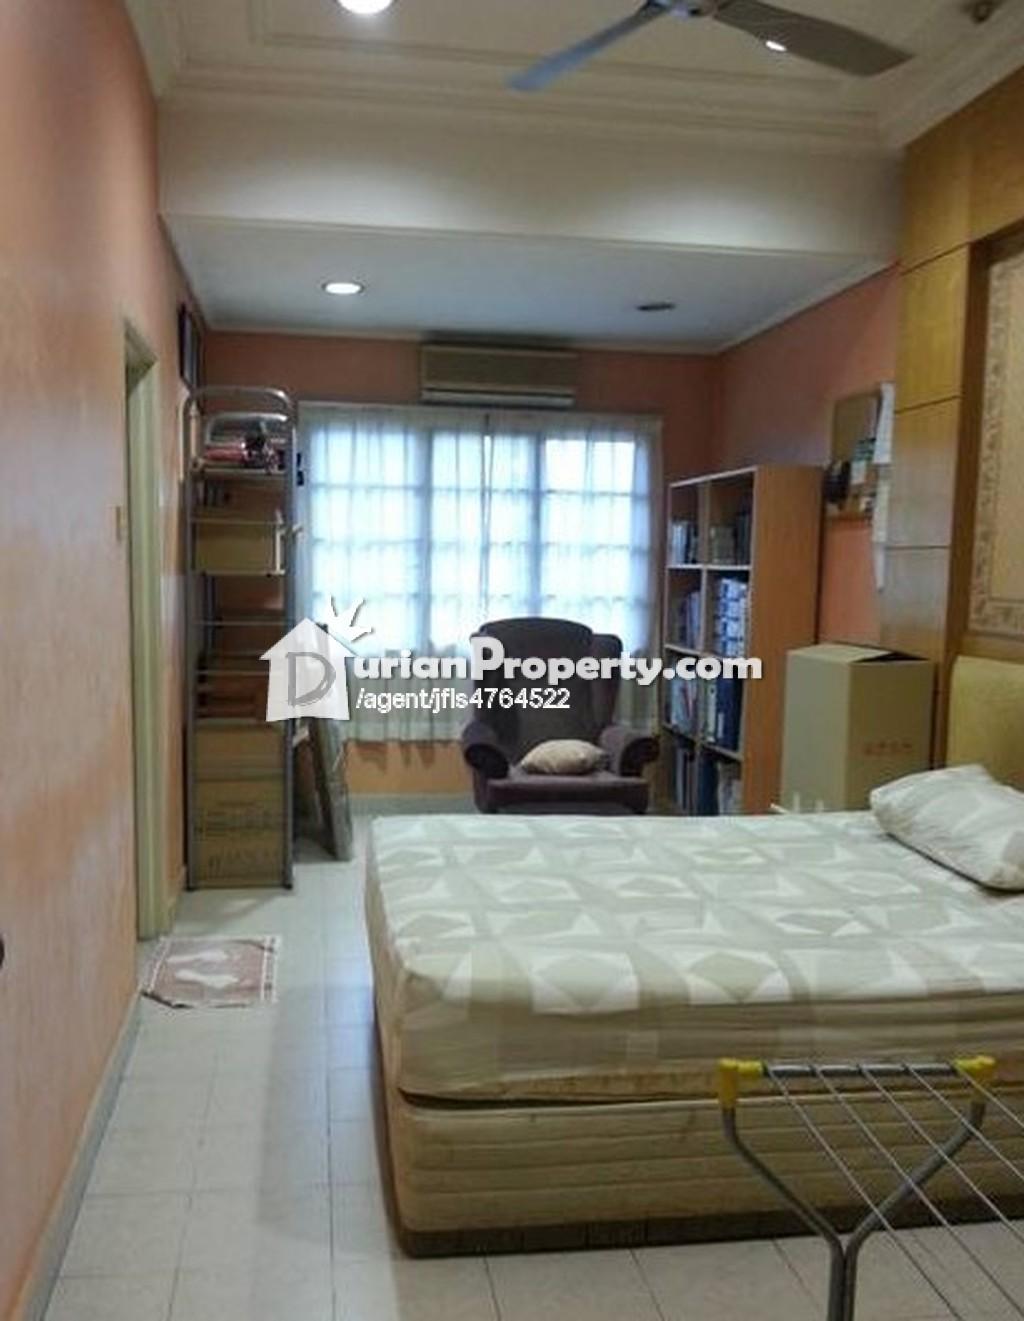 Terrace House For Sale At USJ  USJ For RM  By Joe Fang - Location map of usj 16